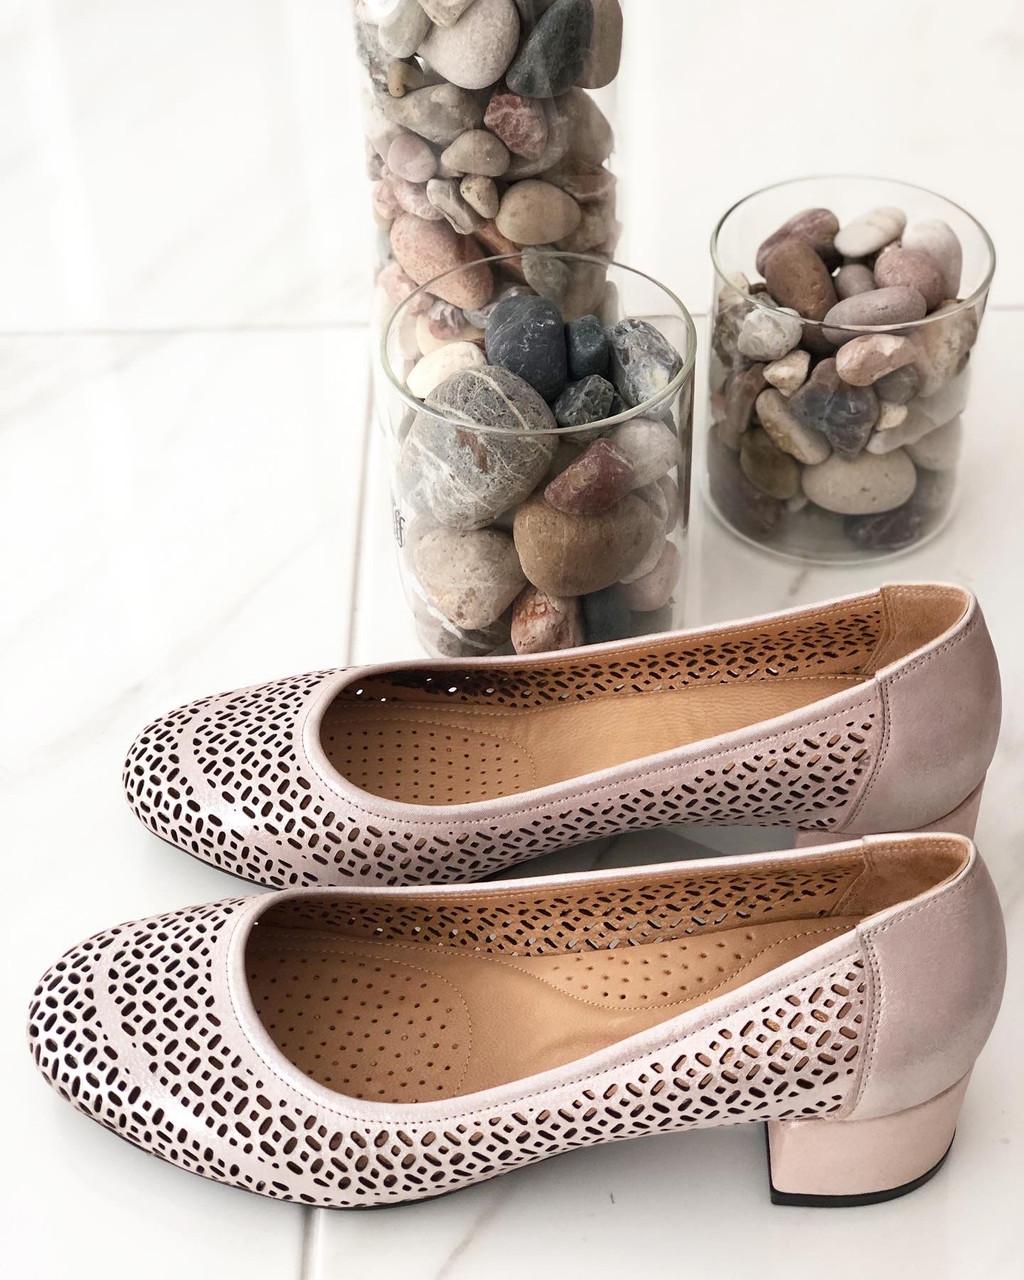 Кожаные Женские туфли 5648 пуд размеры 36,39